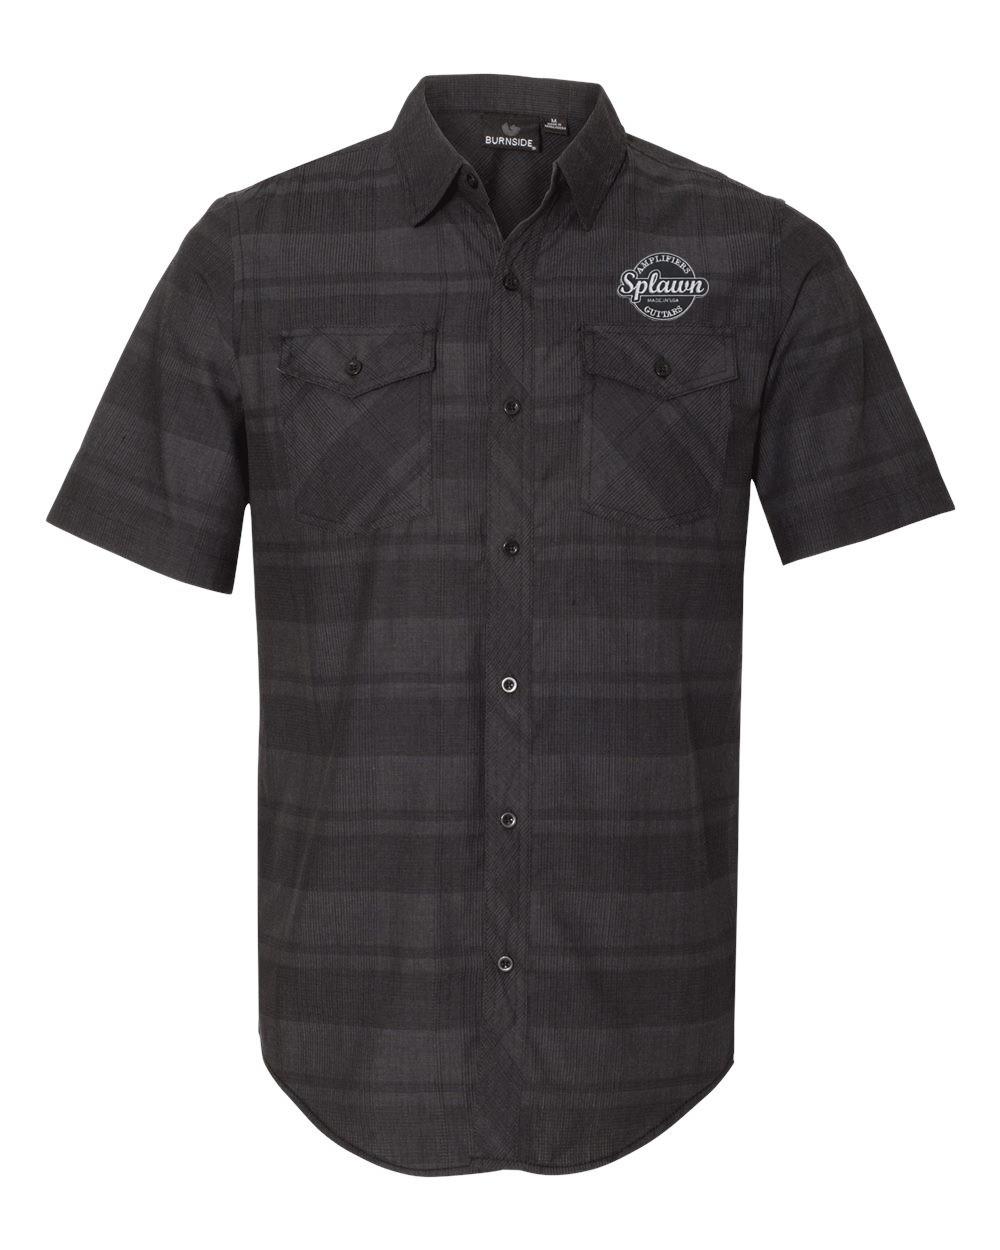 Splawn Amplification Guitars Logo Black BURNSIDE Work Shirt